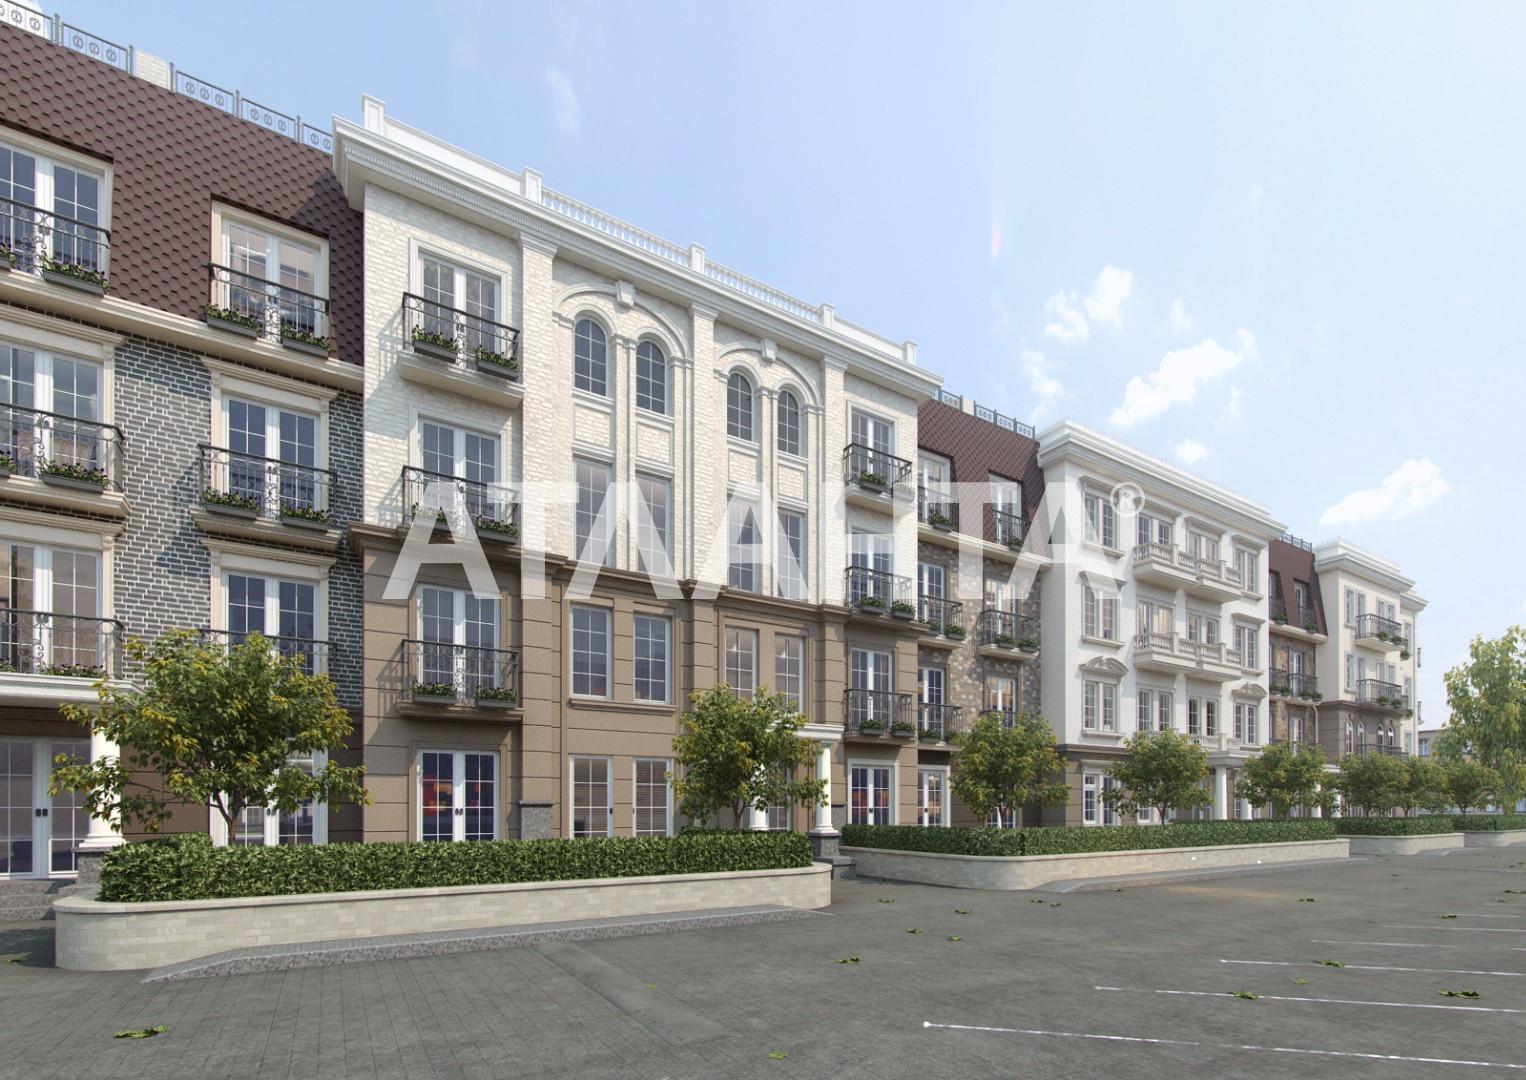 Продается 1-комнатная Квартира на ул. Майский Пер. — 70 120 у.е. (фото №3)